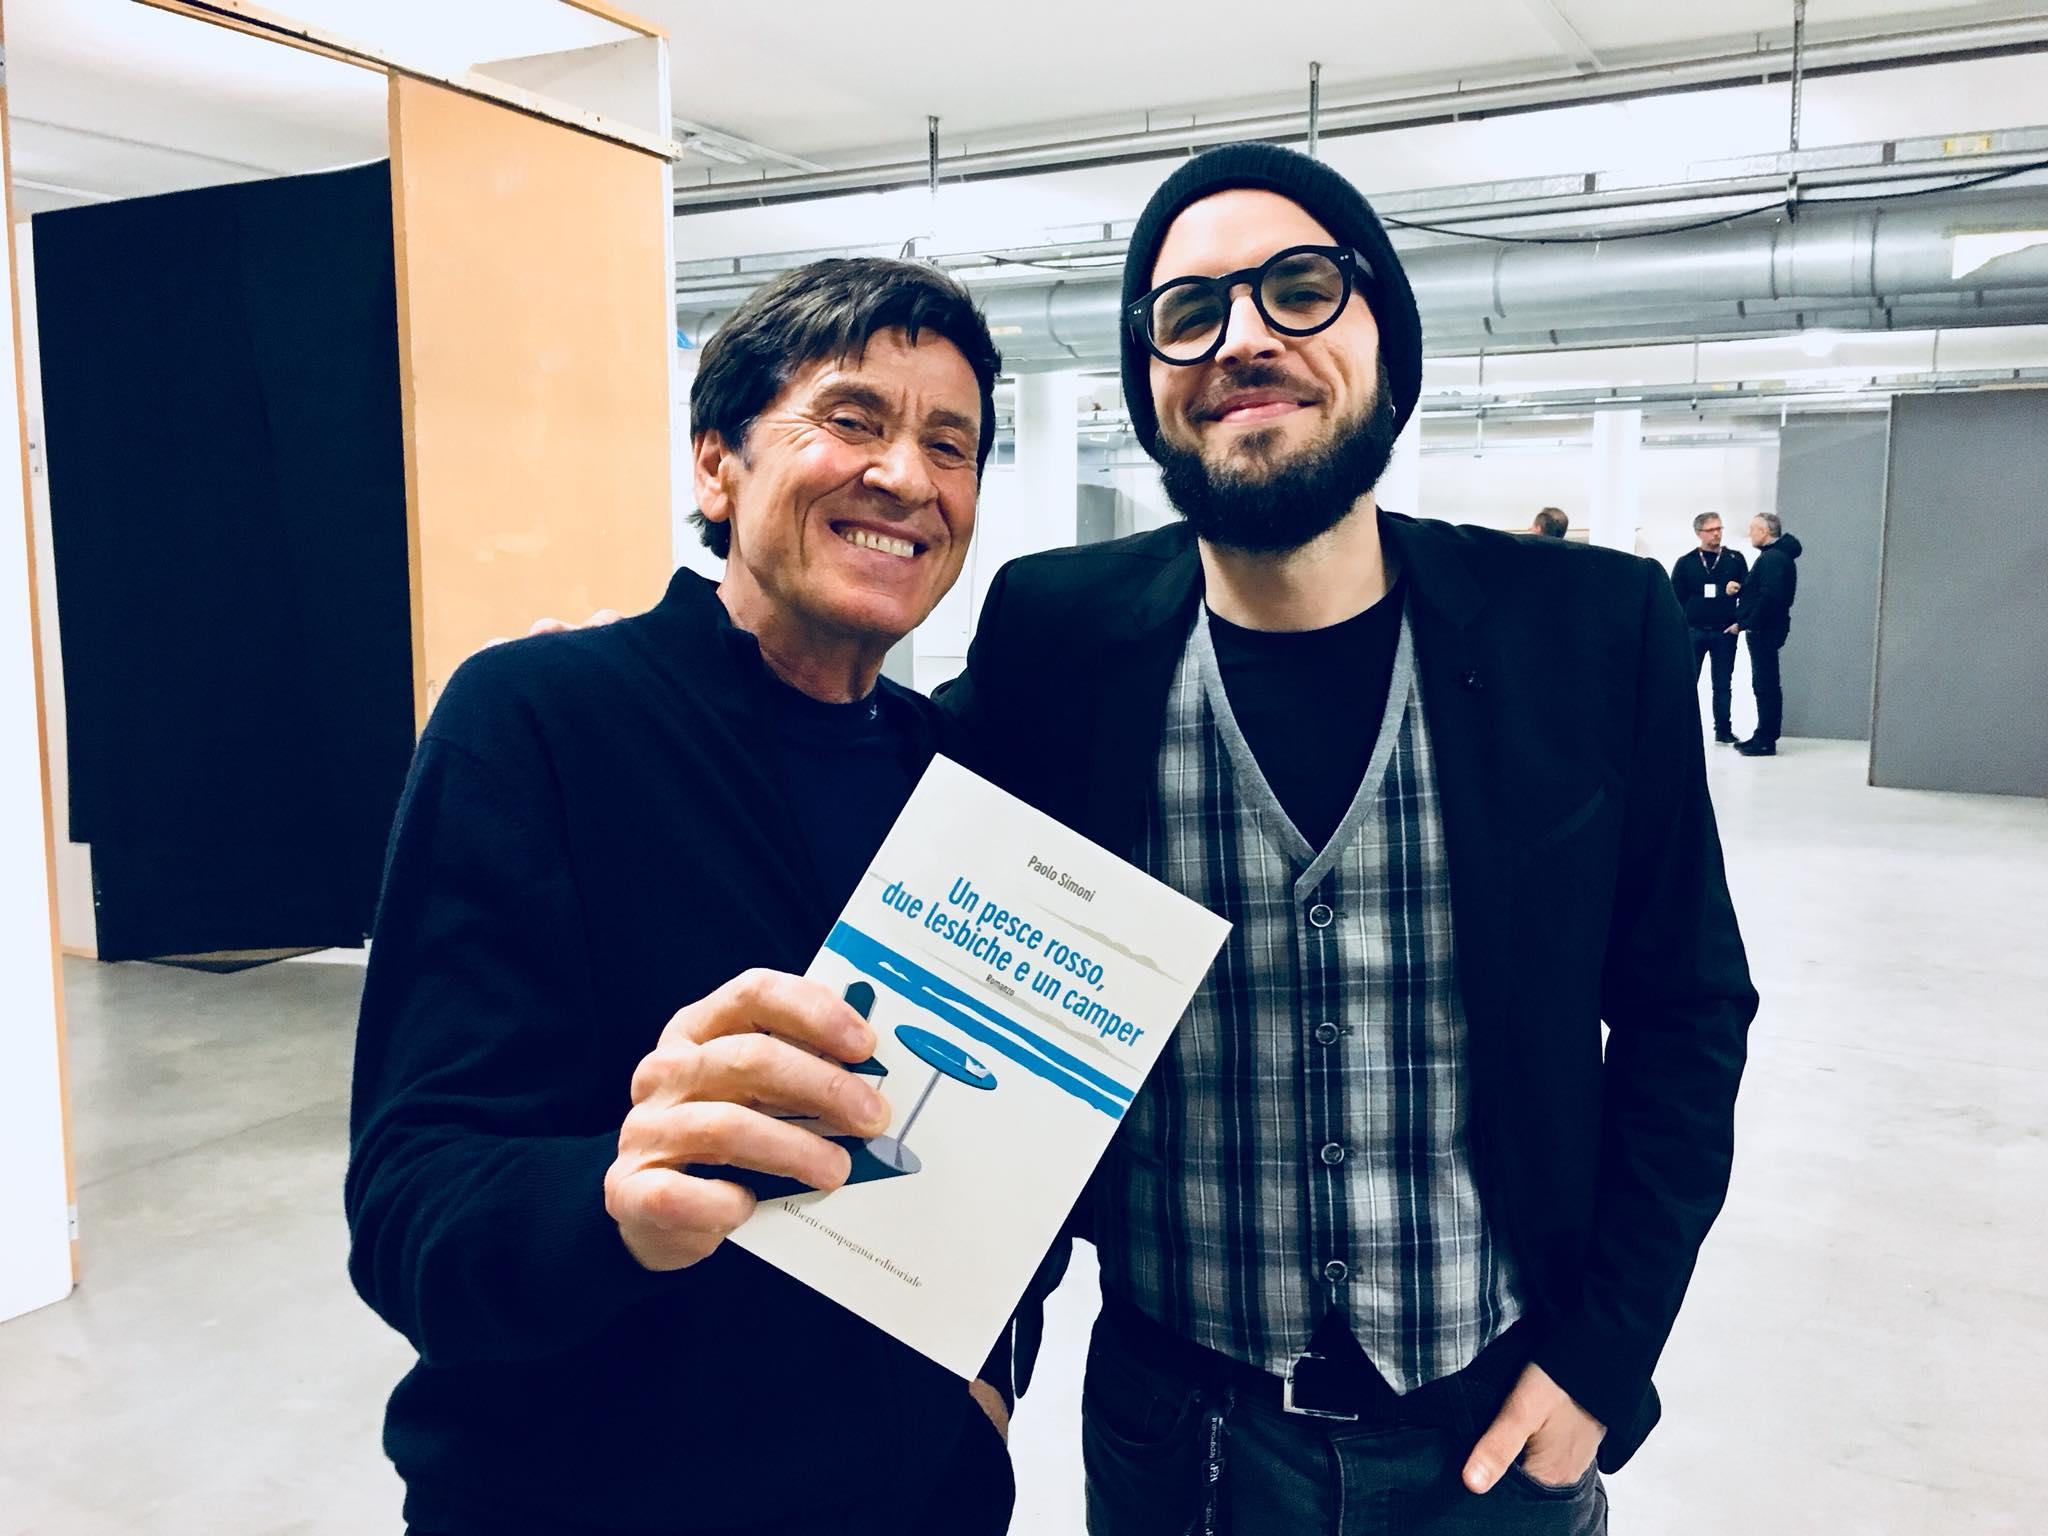 Paolo Simoni e Gianni Morandi